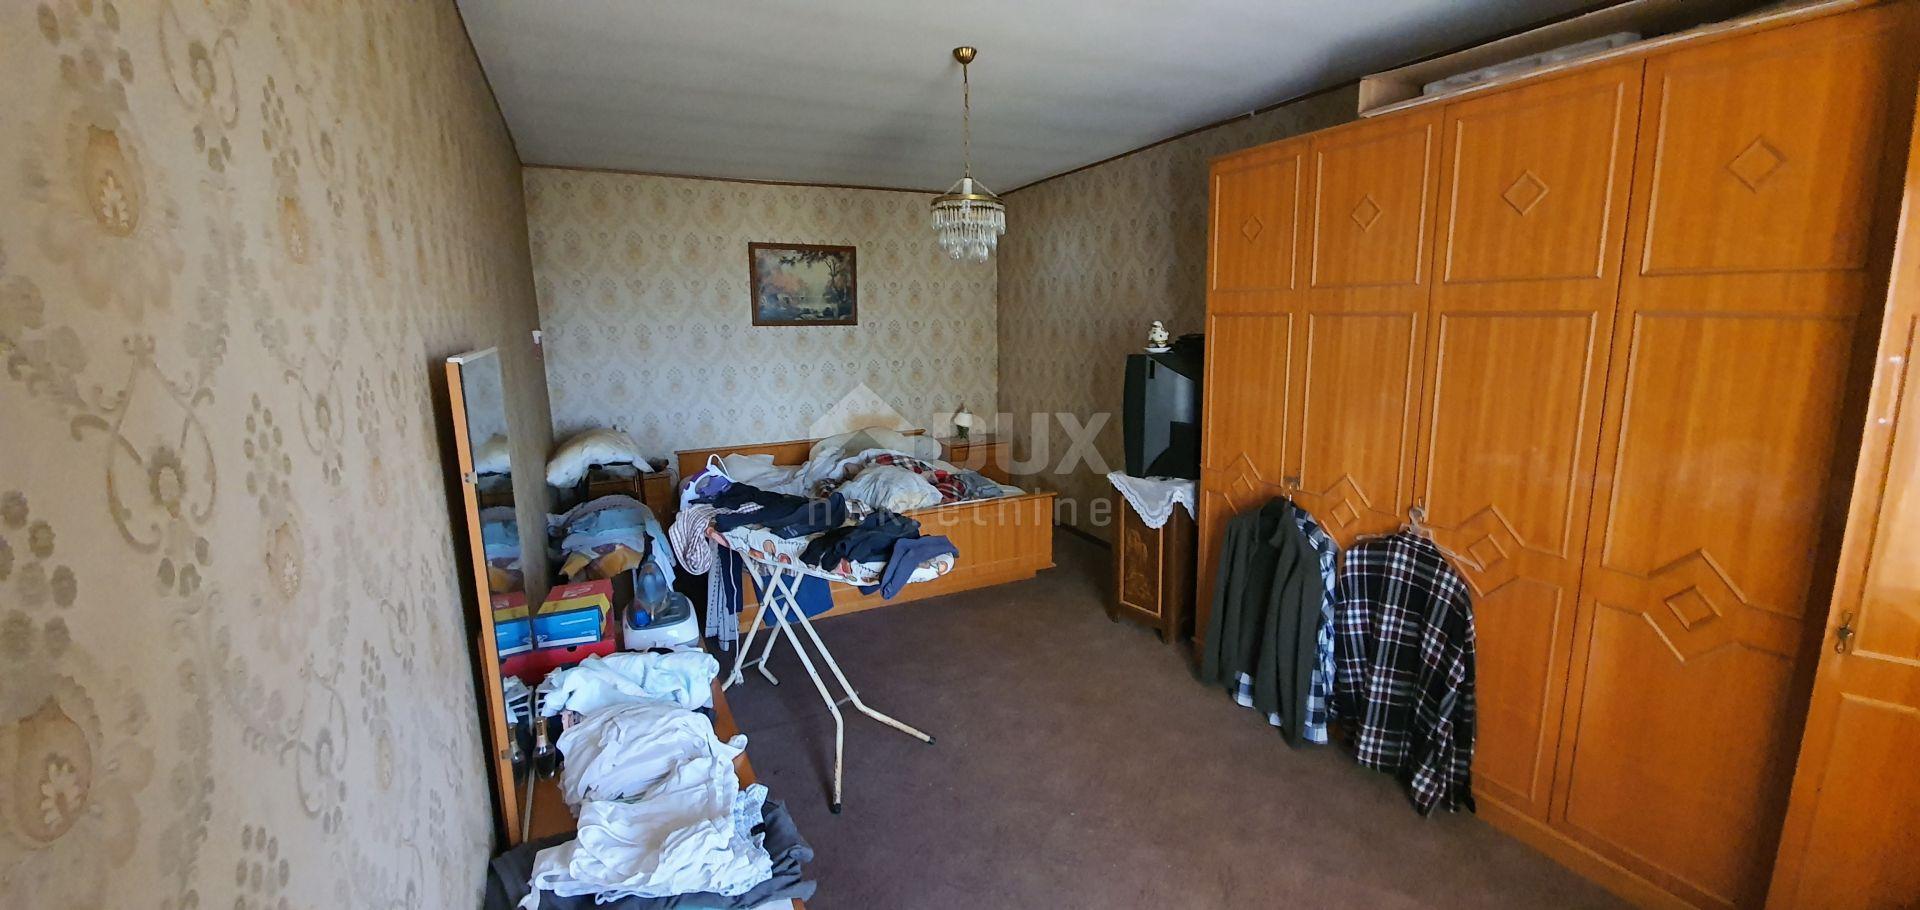 Appartamento Opatija - Centar, Opatija, 187m2